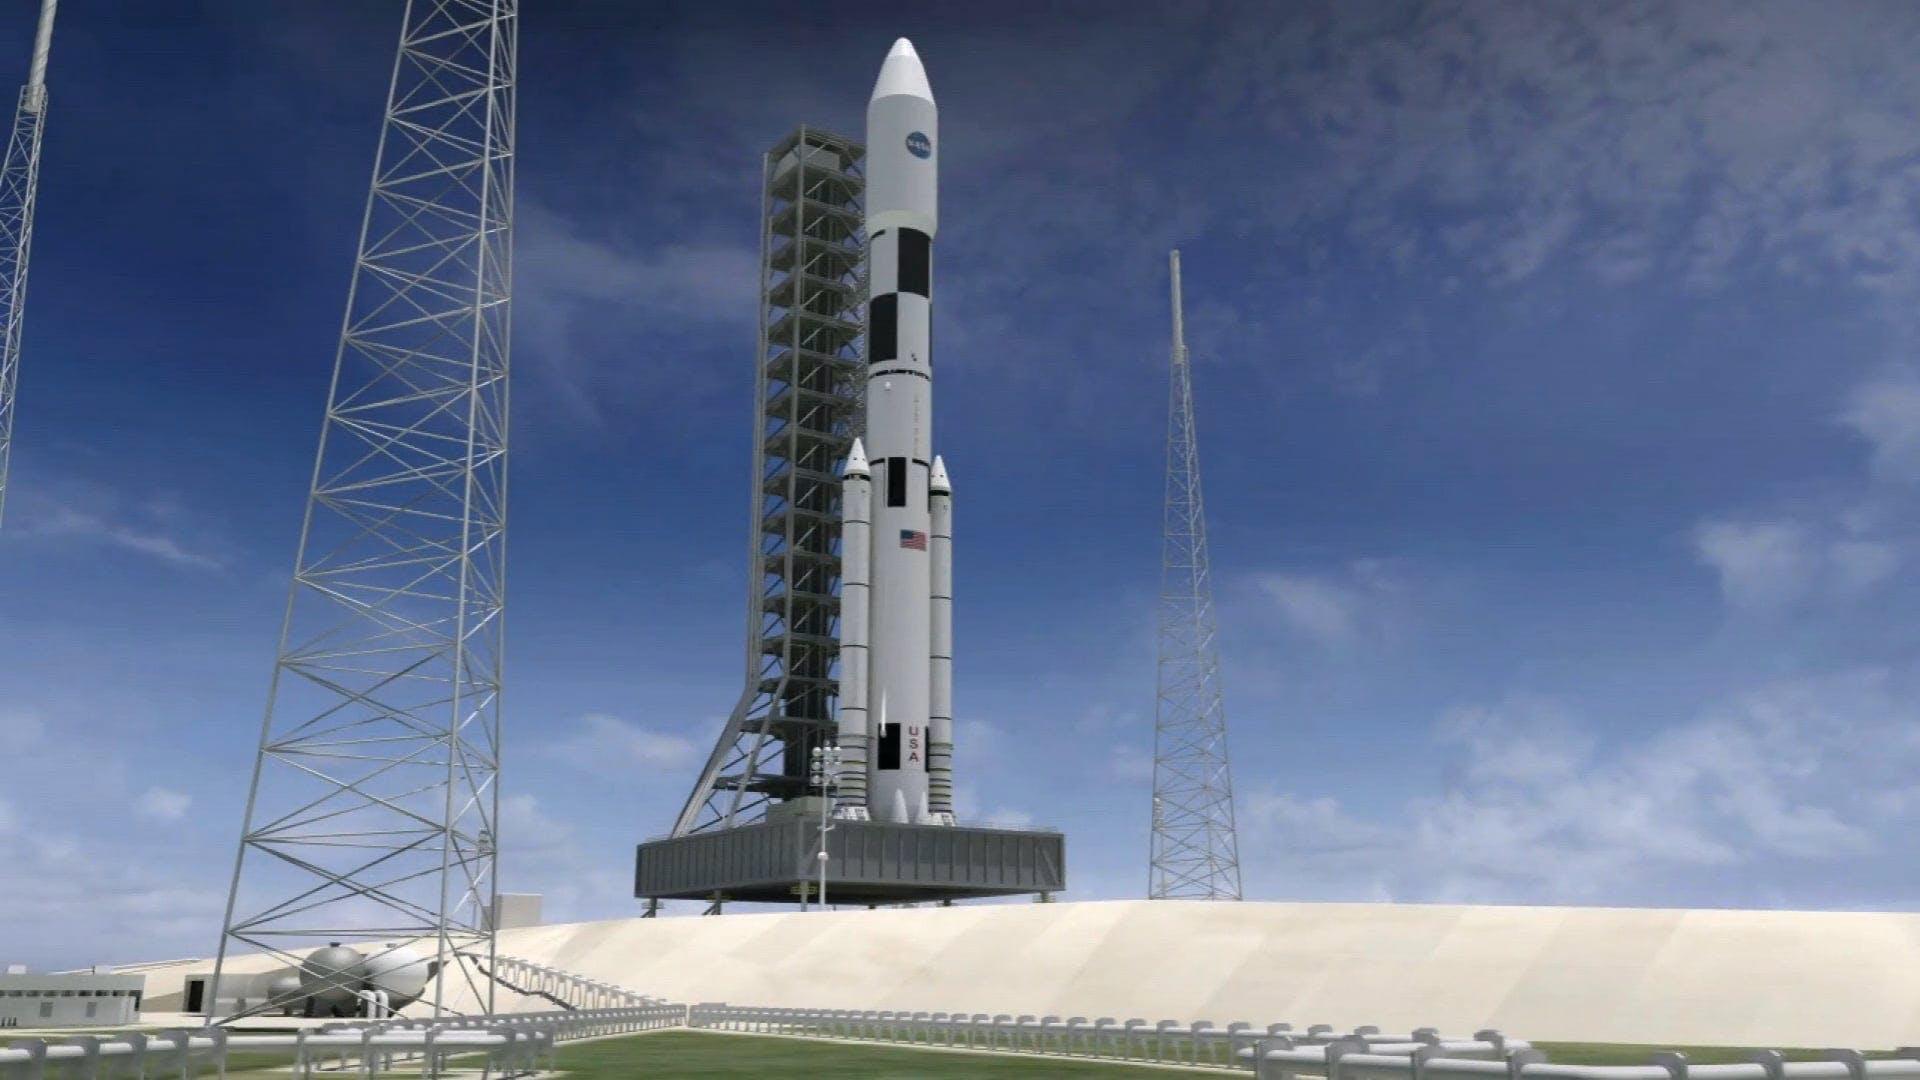 CG Animation Of Rocket Launching